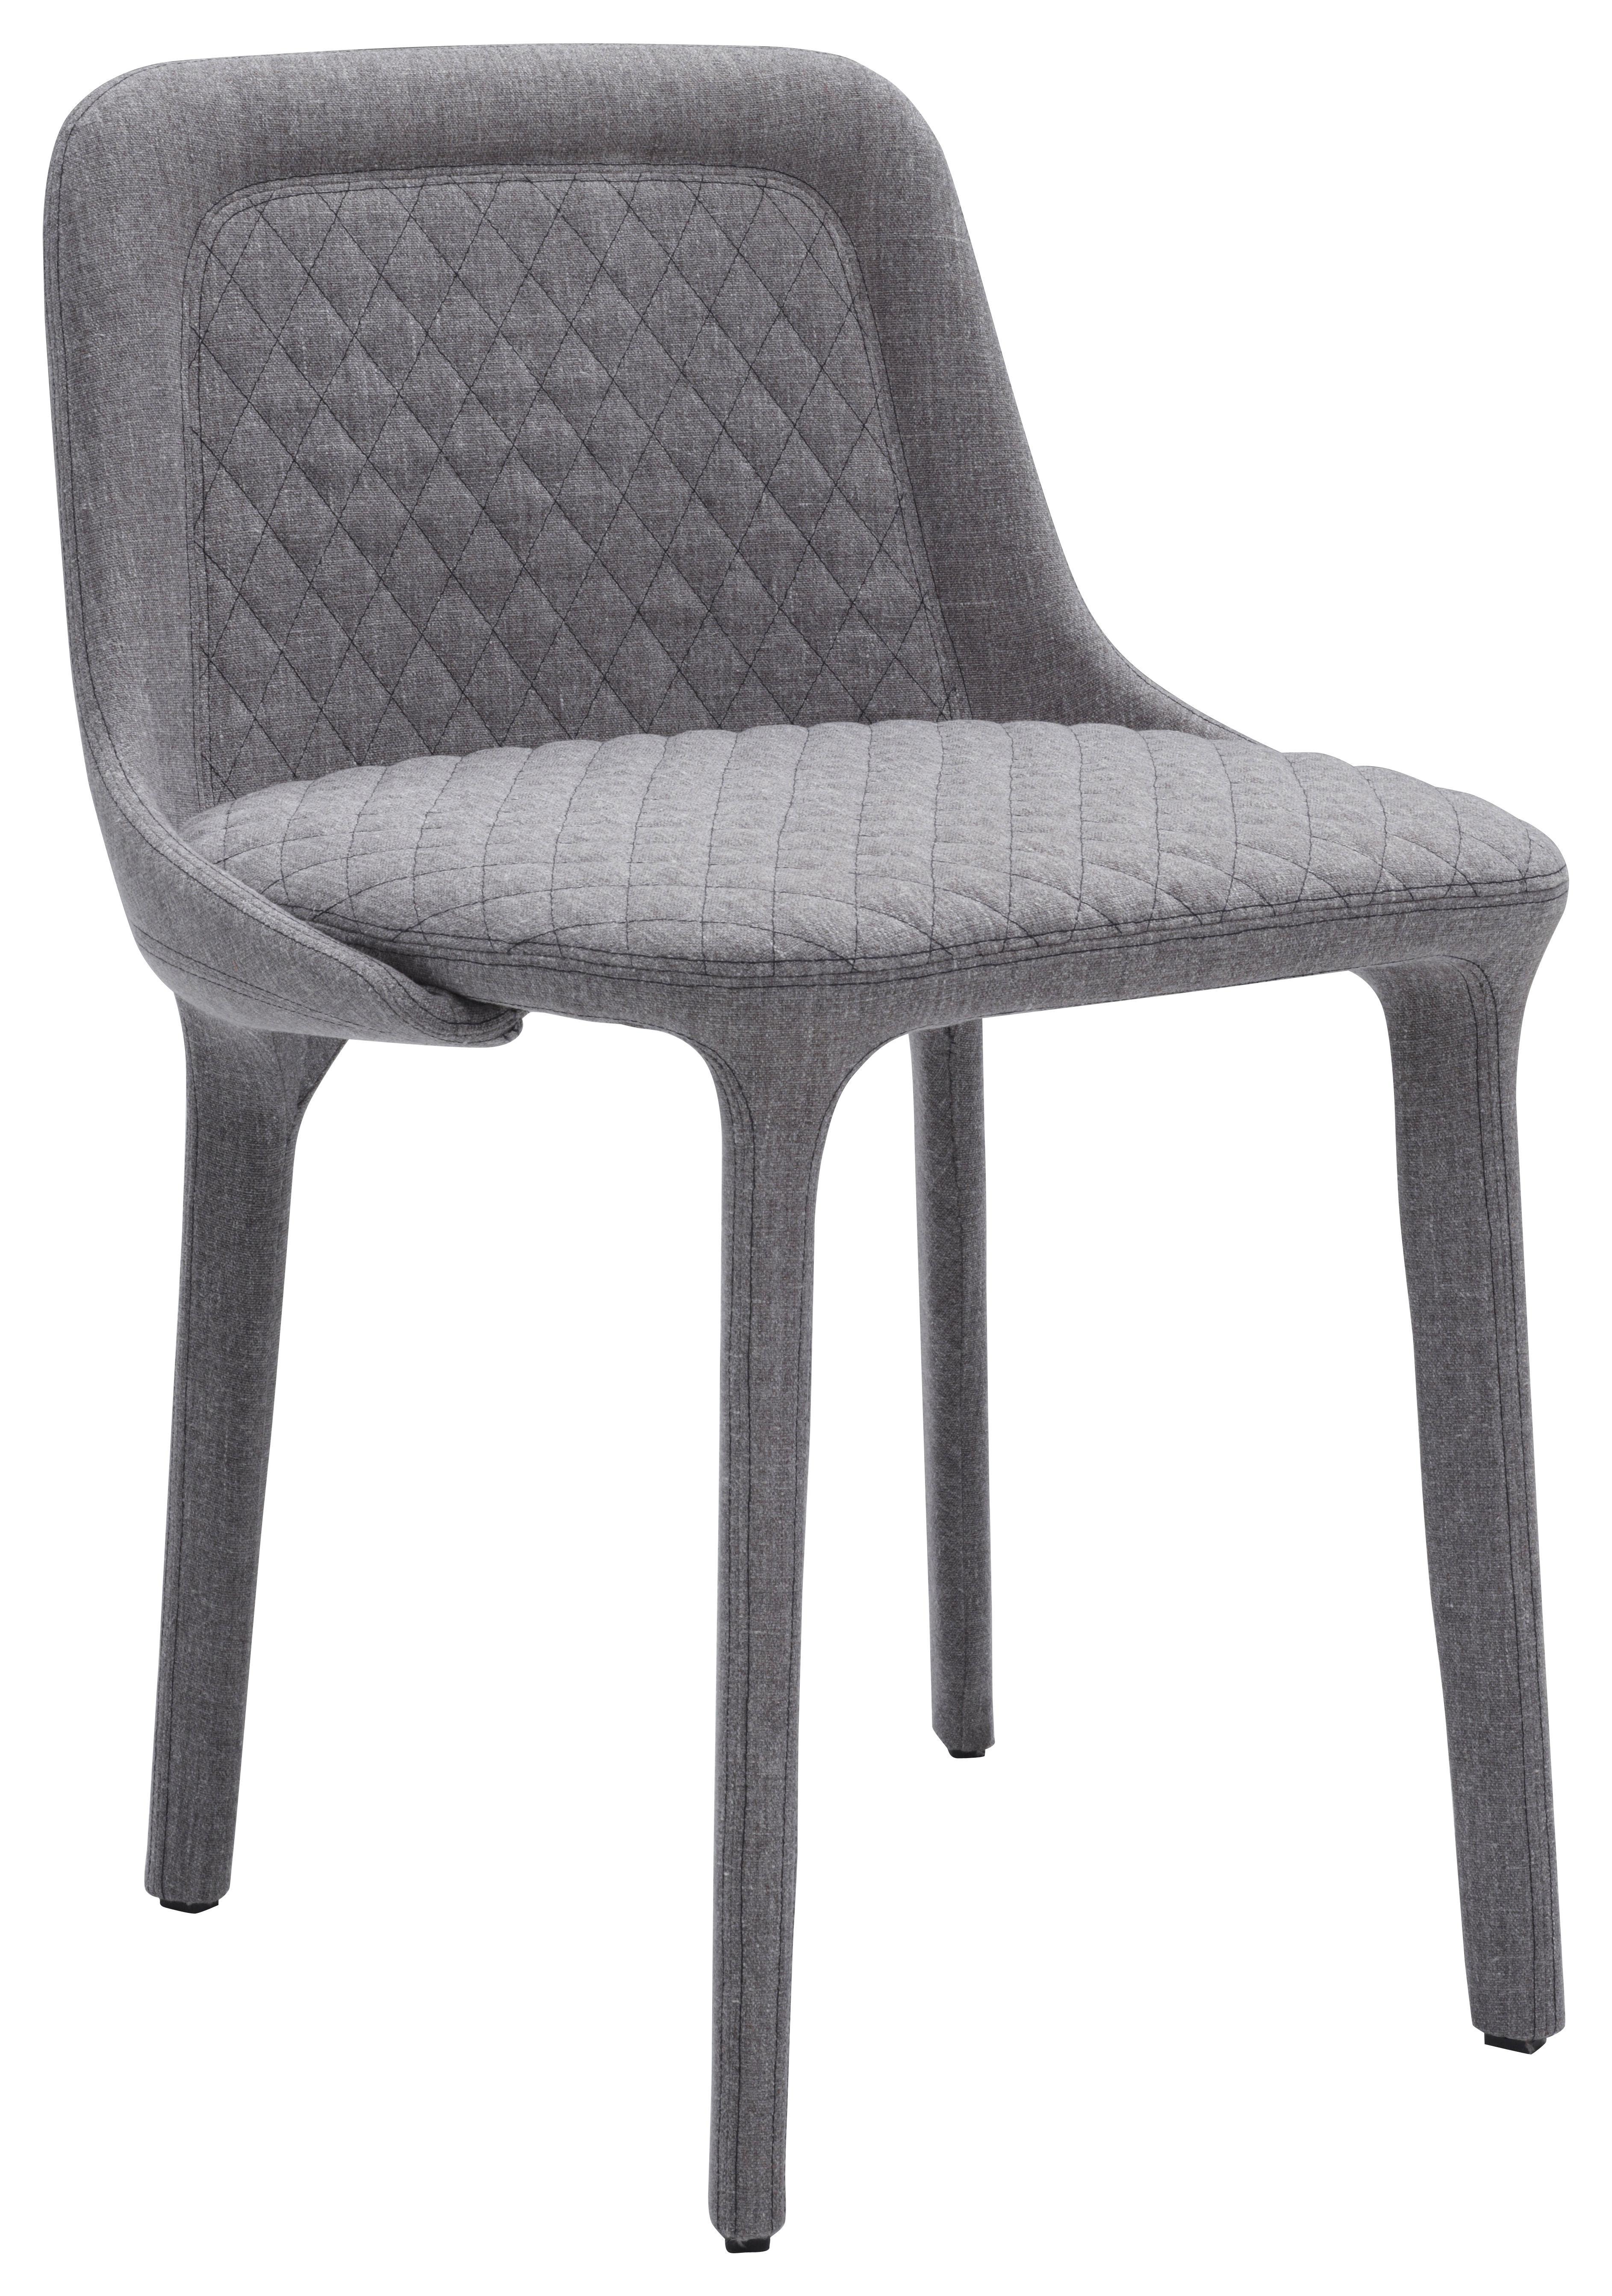 Möbel - Stühle  - Lepel Gepolsterter Stuhl / Stoffbezug, gesteppt - Casamania - Stoff